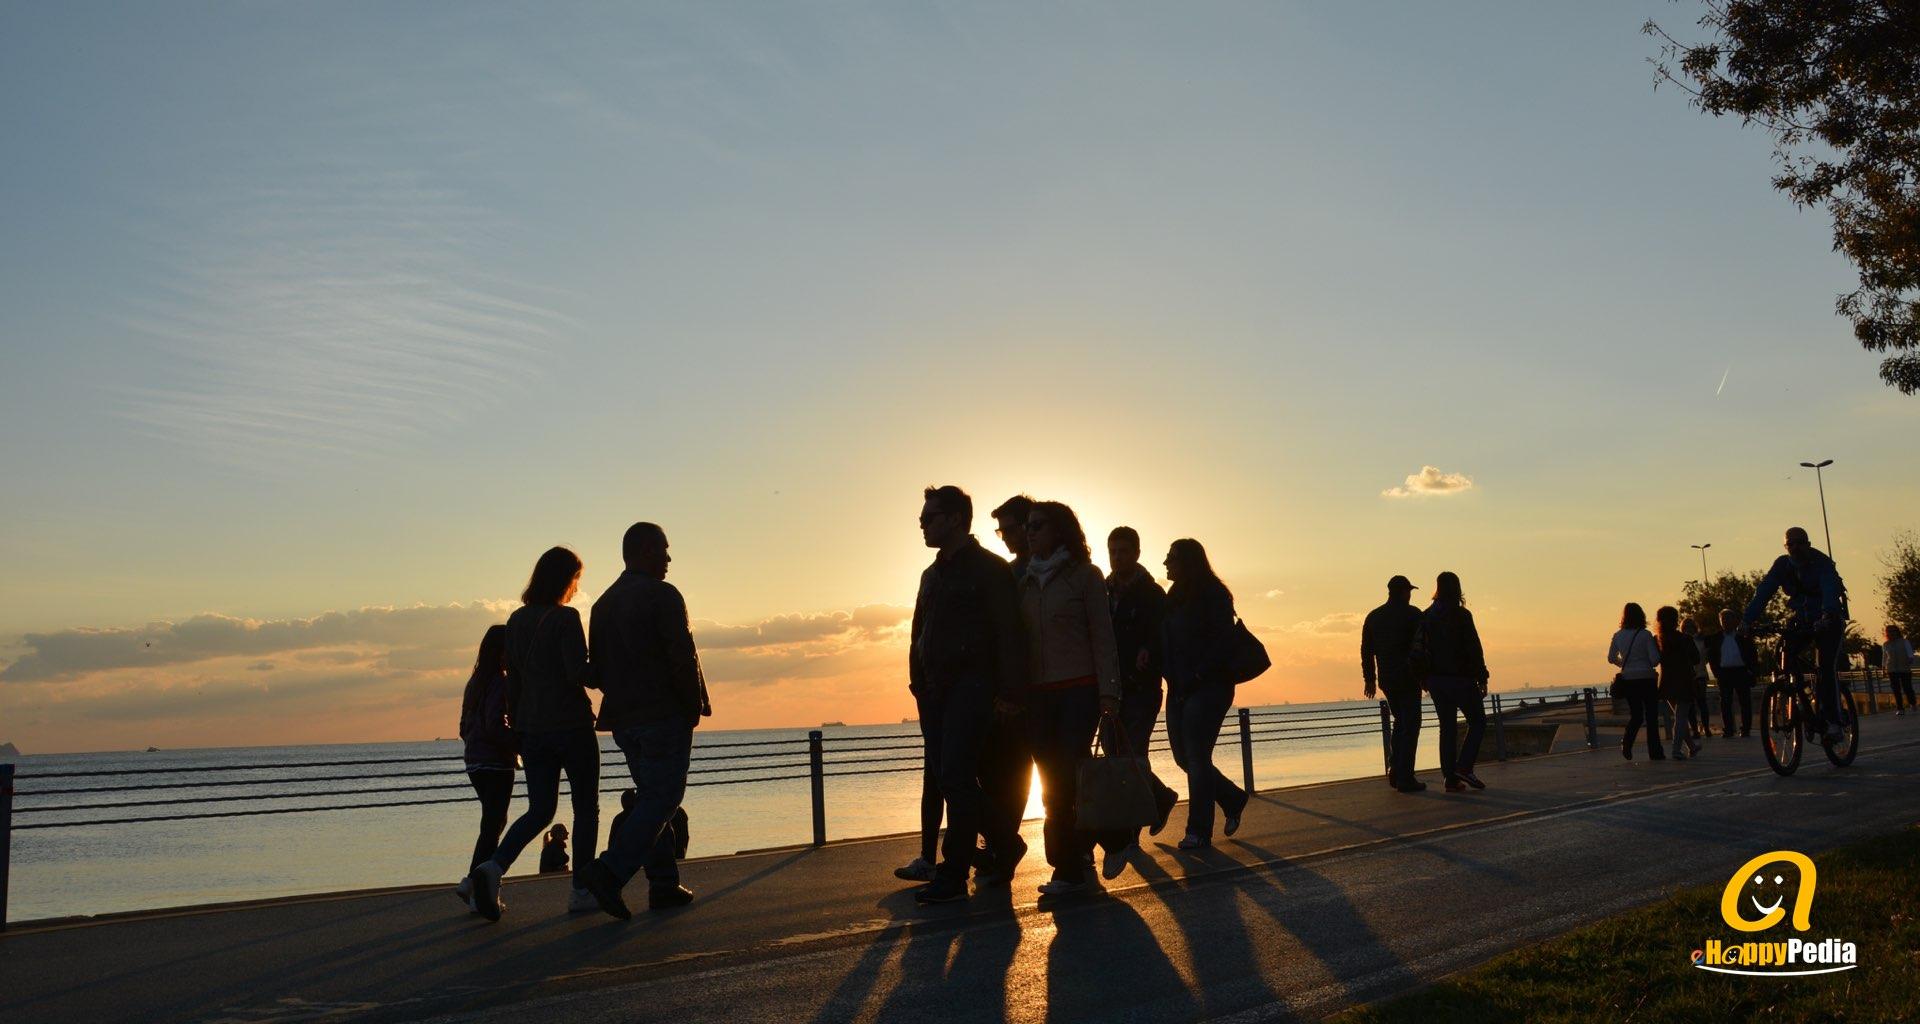 blog - people sunset beach walk.jpeg